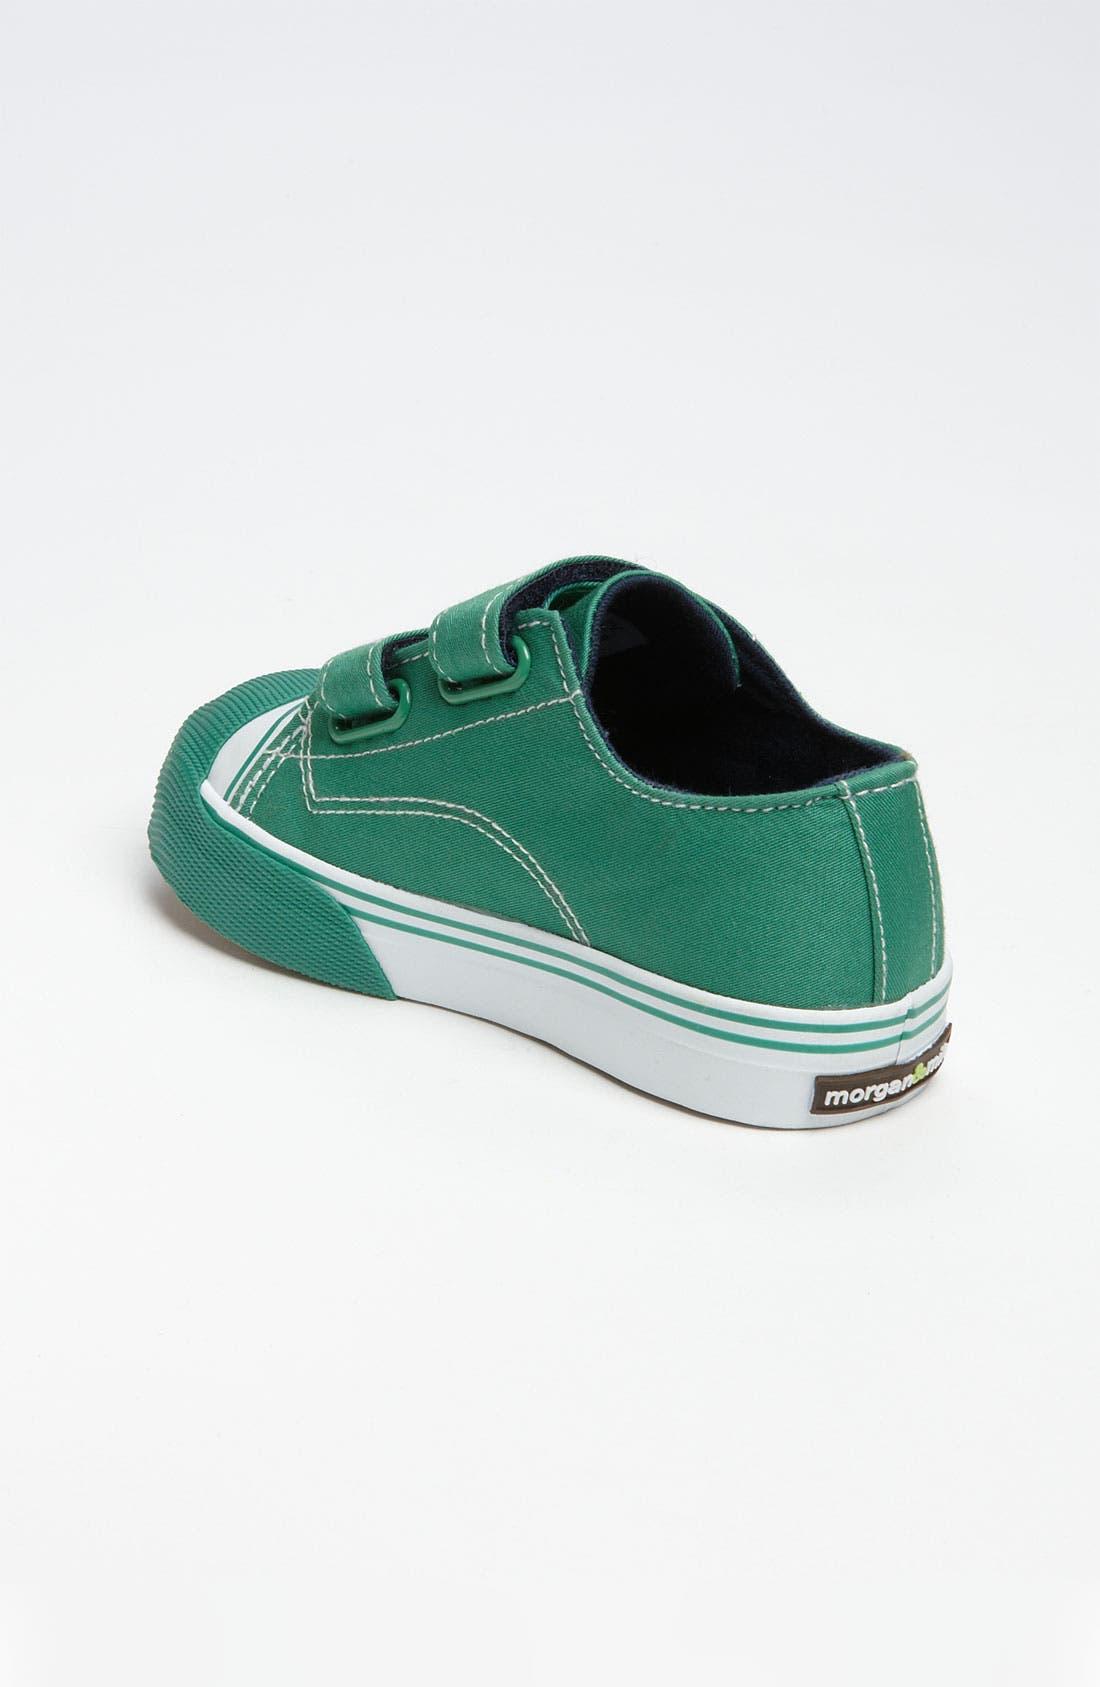 Alternate Image 2  - Morgan & Milo 'Avery II' Sneaker (Walker & Toddler)